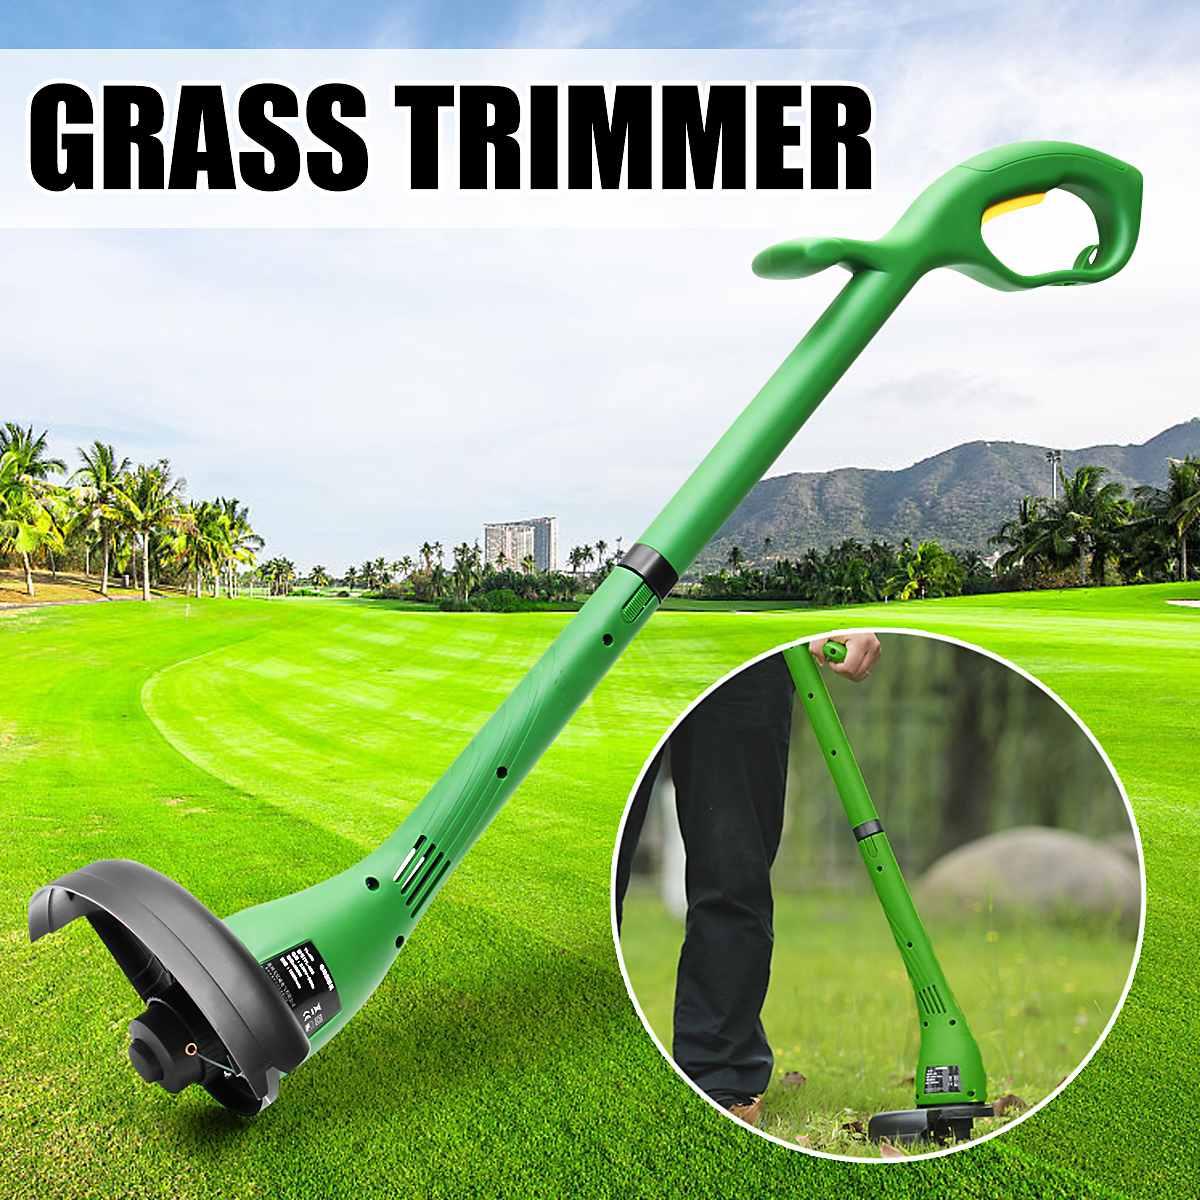 500W Peaks Electric Grass Trimmer Strimmer Cutter Lawnmower Heavy Duty Lawn Mower Pruning Machine 230mm Garden  Tools